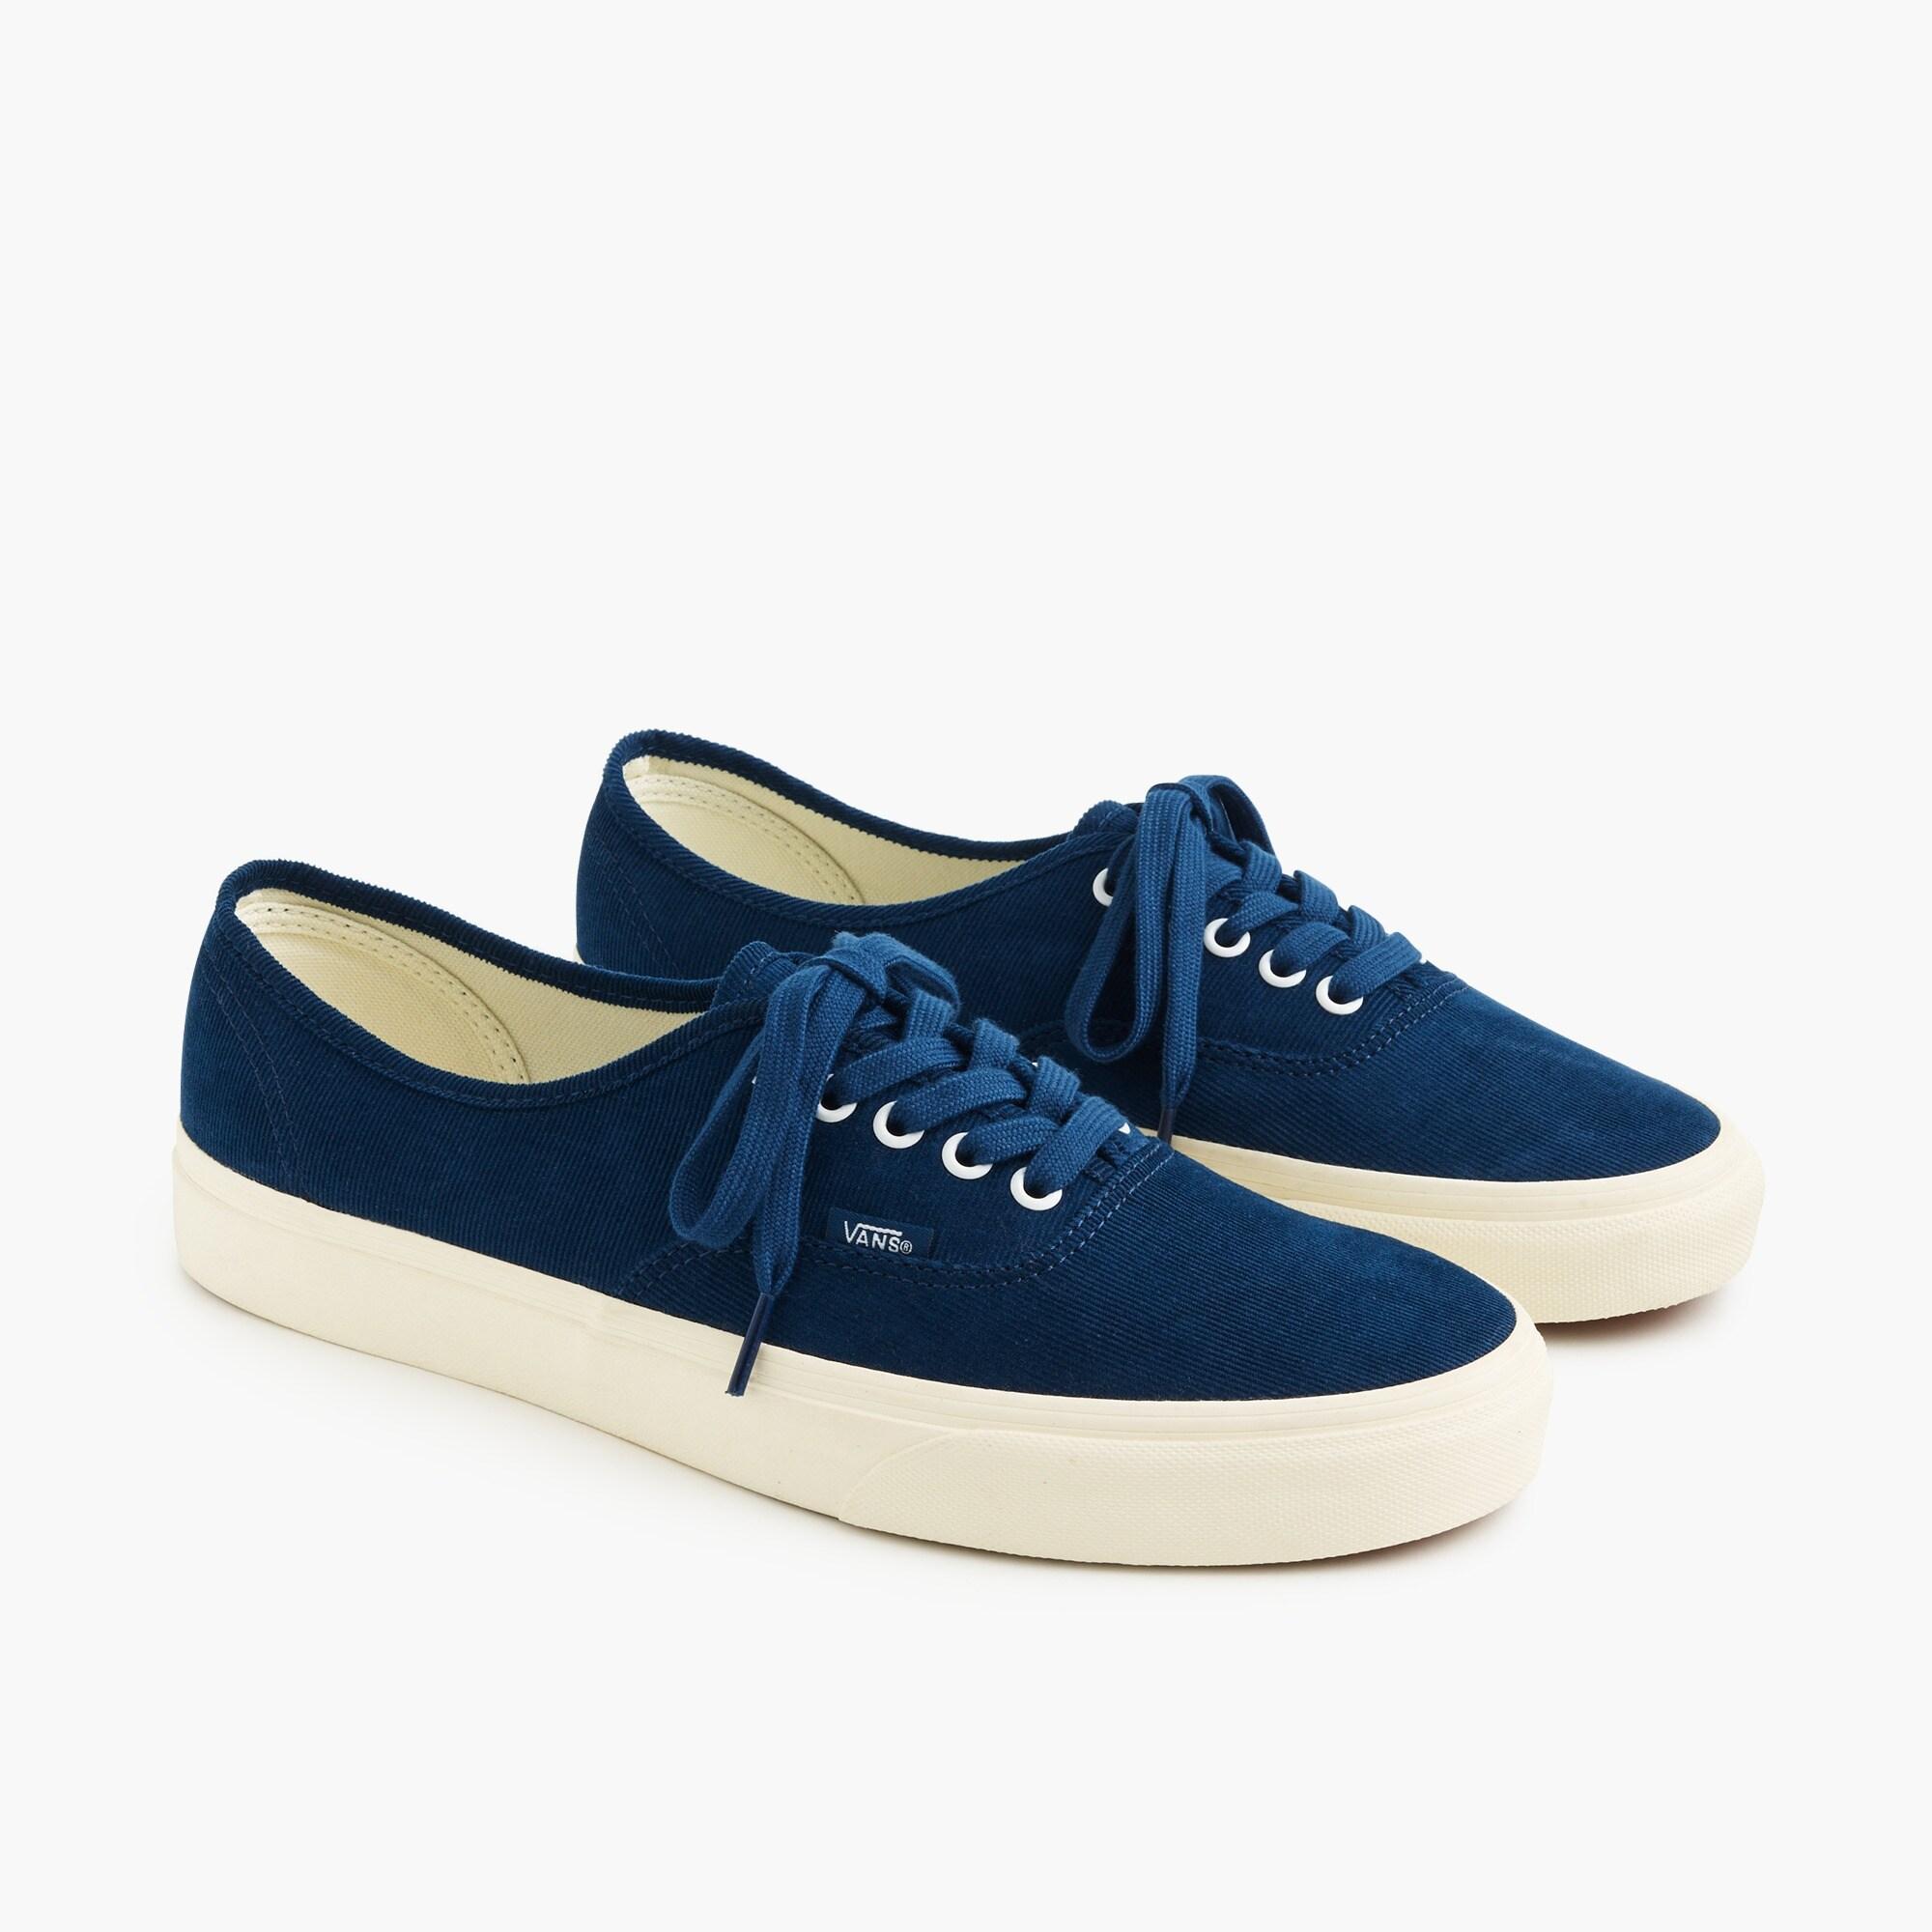 Vans® for J.Crew Authentic sneakers in Bedford cord